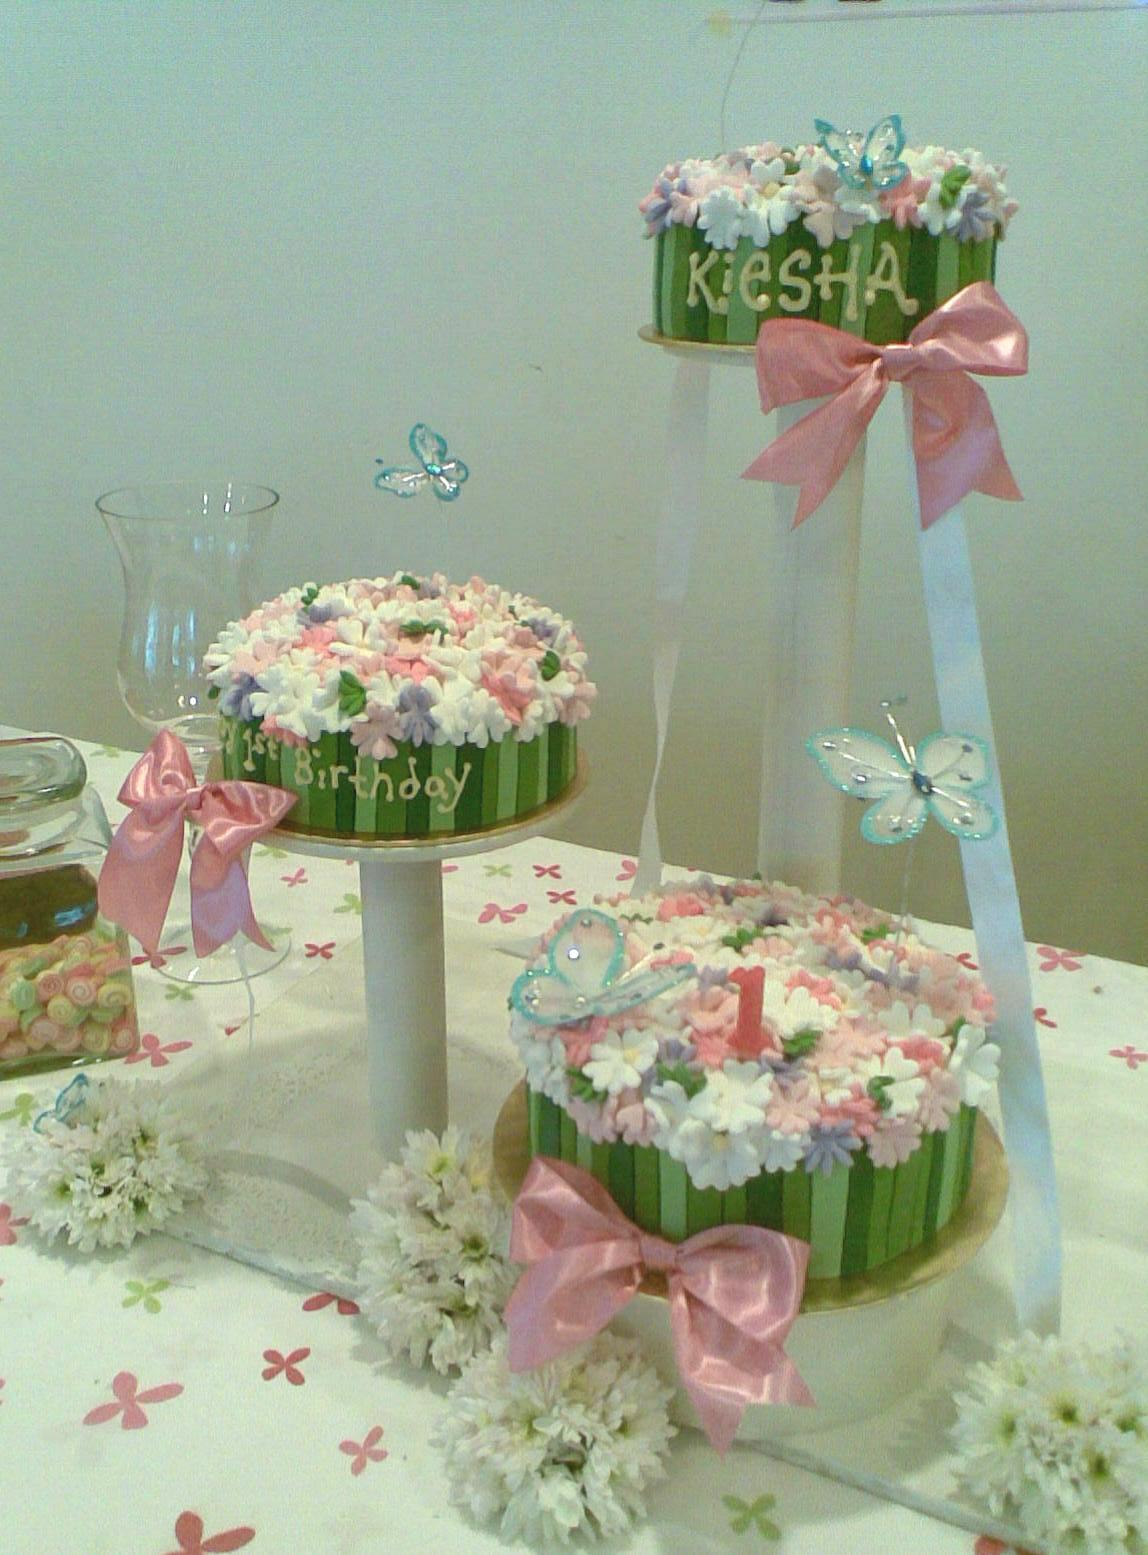 Lailys ptisserie sweet kieshas birthday cake flower garden theme izmirmasajfo